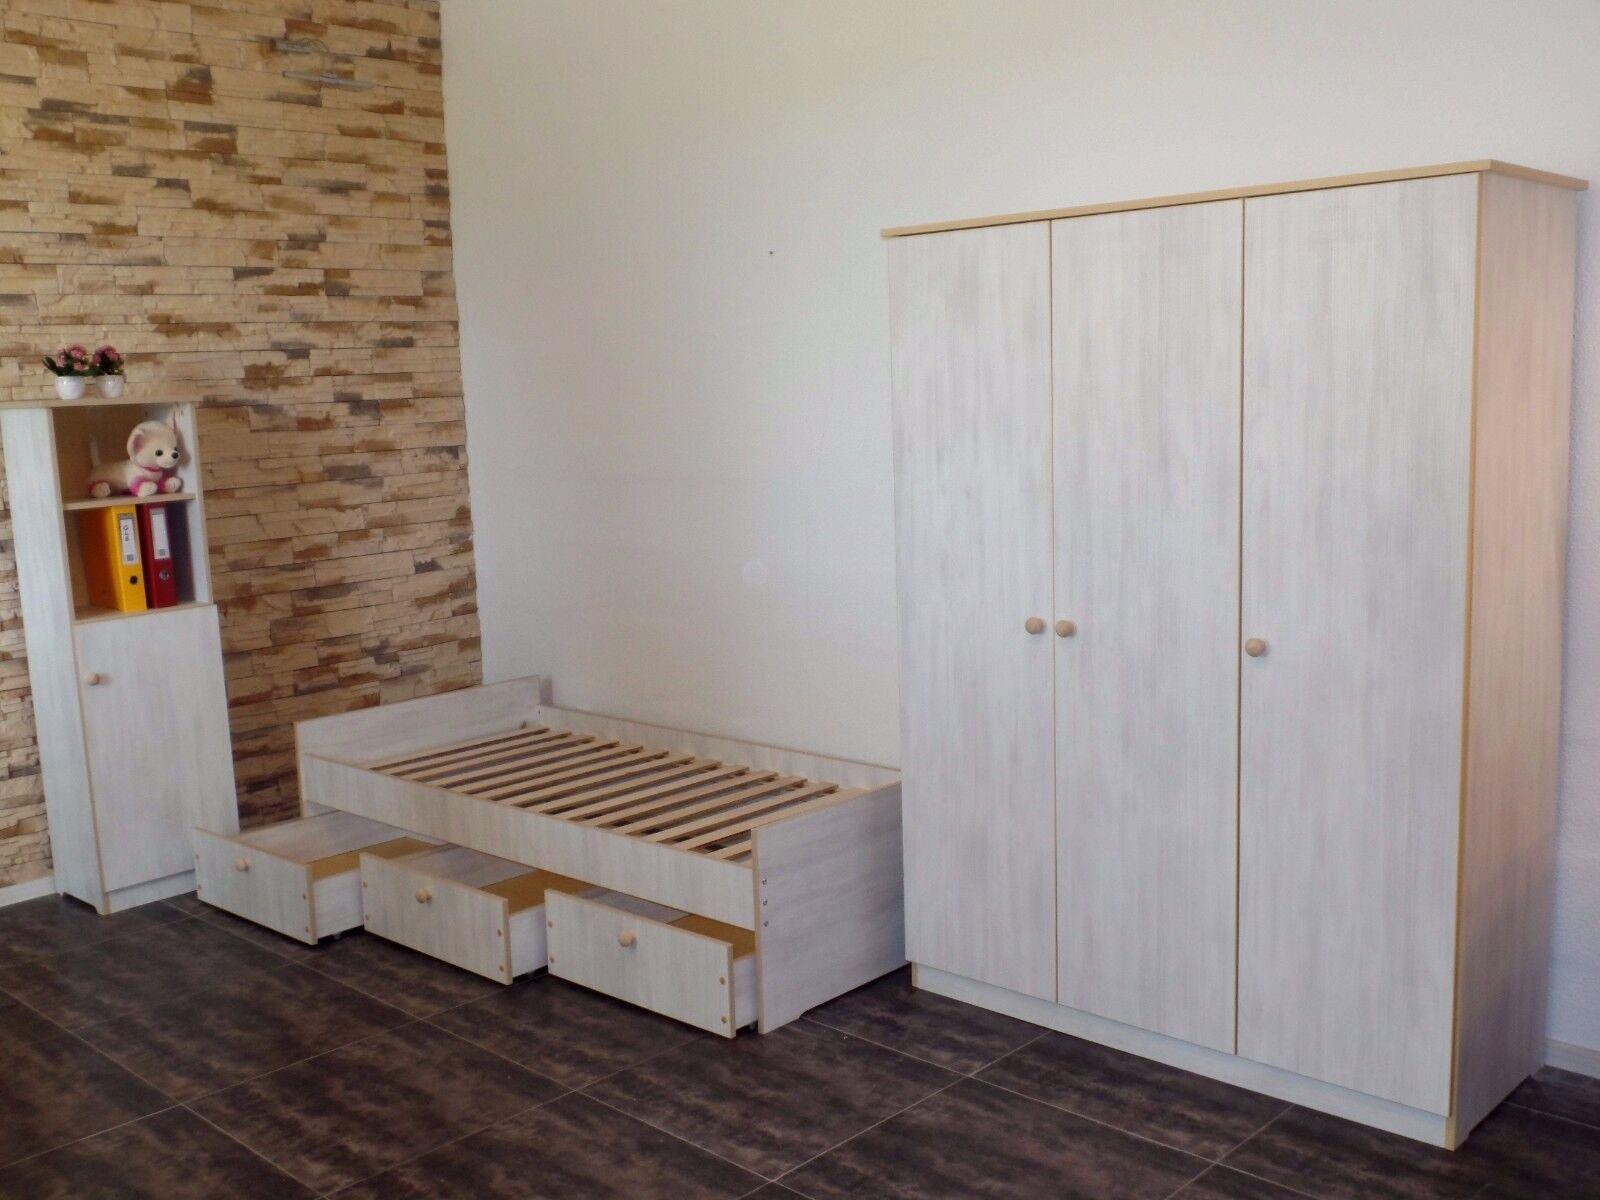 kinderbett jugendbett 100x200 kojenbett funktionsbett einzelbett wei grau eur 115 90. Black Bedroom Furniture Sets. Home Design Ideas